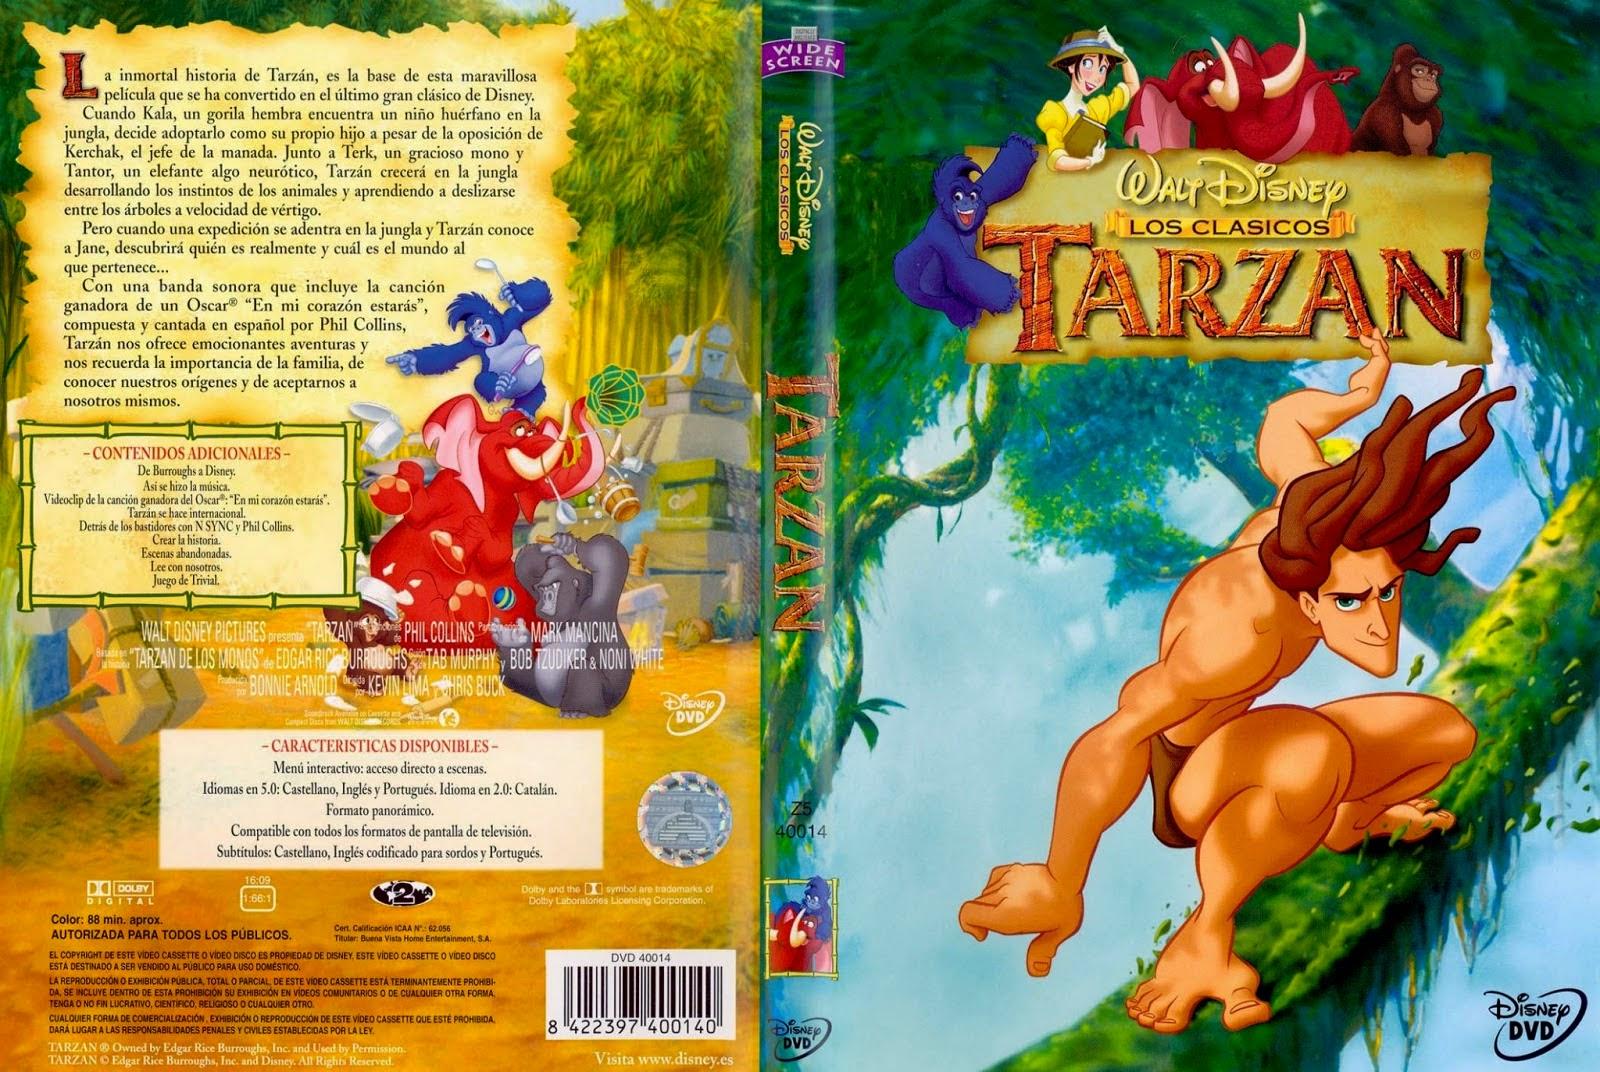 Carátula: Tarzán (1999)